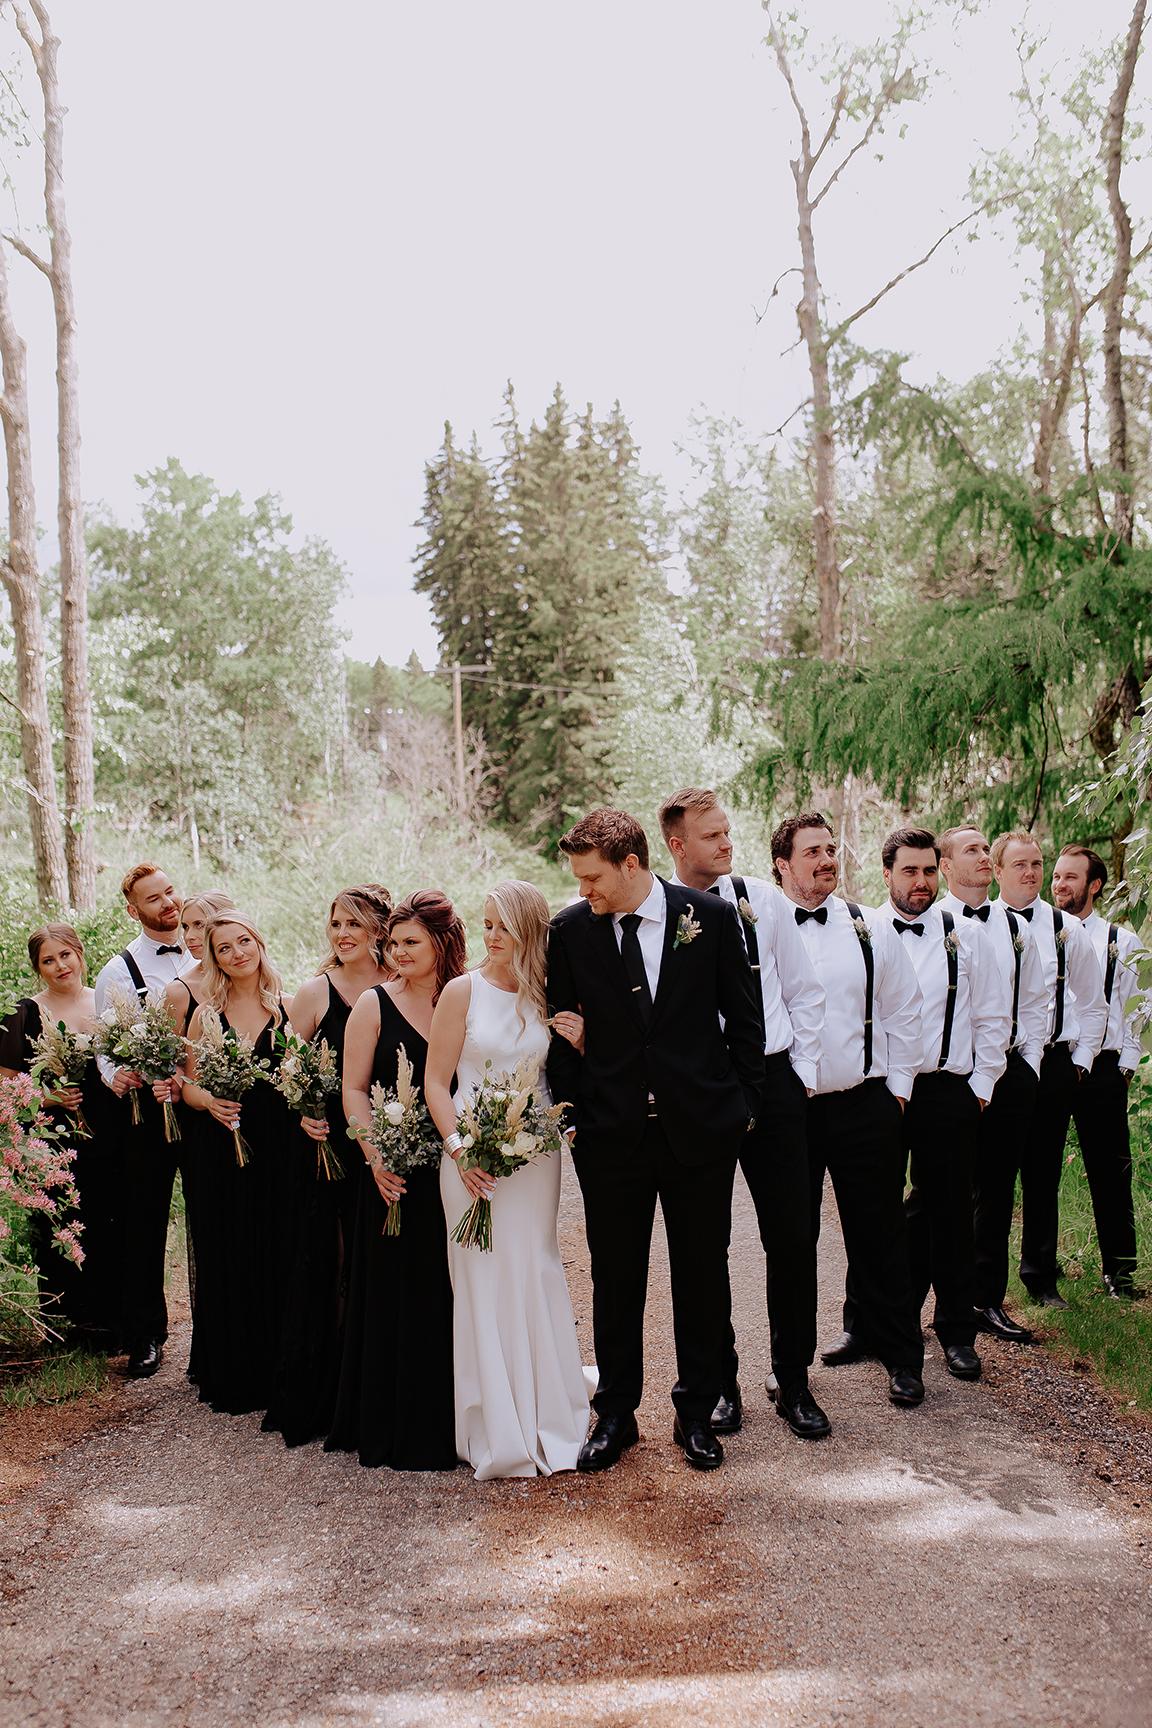 Bridal_Party_11_web.jpg